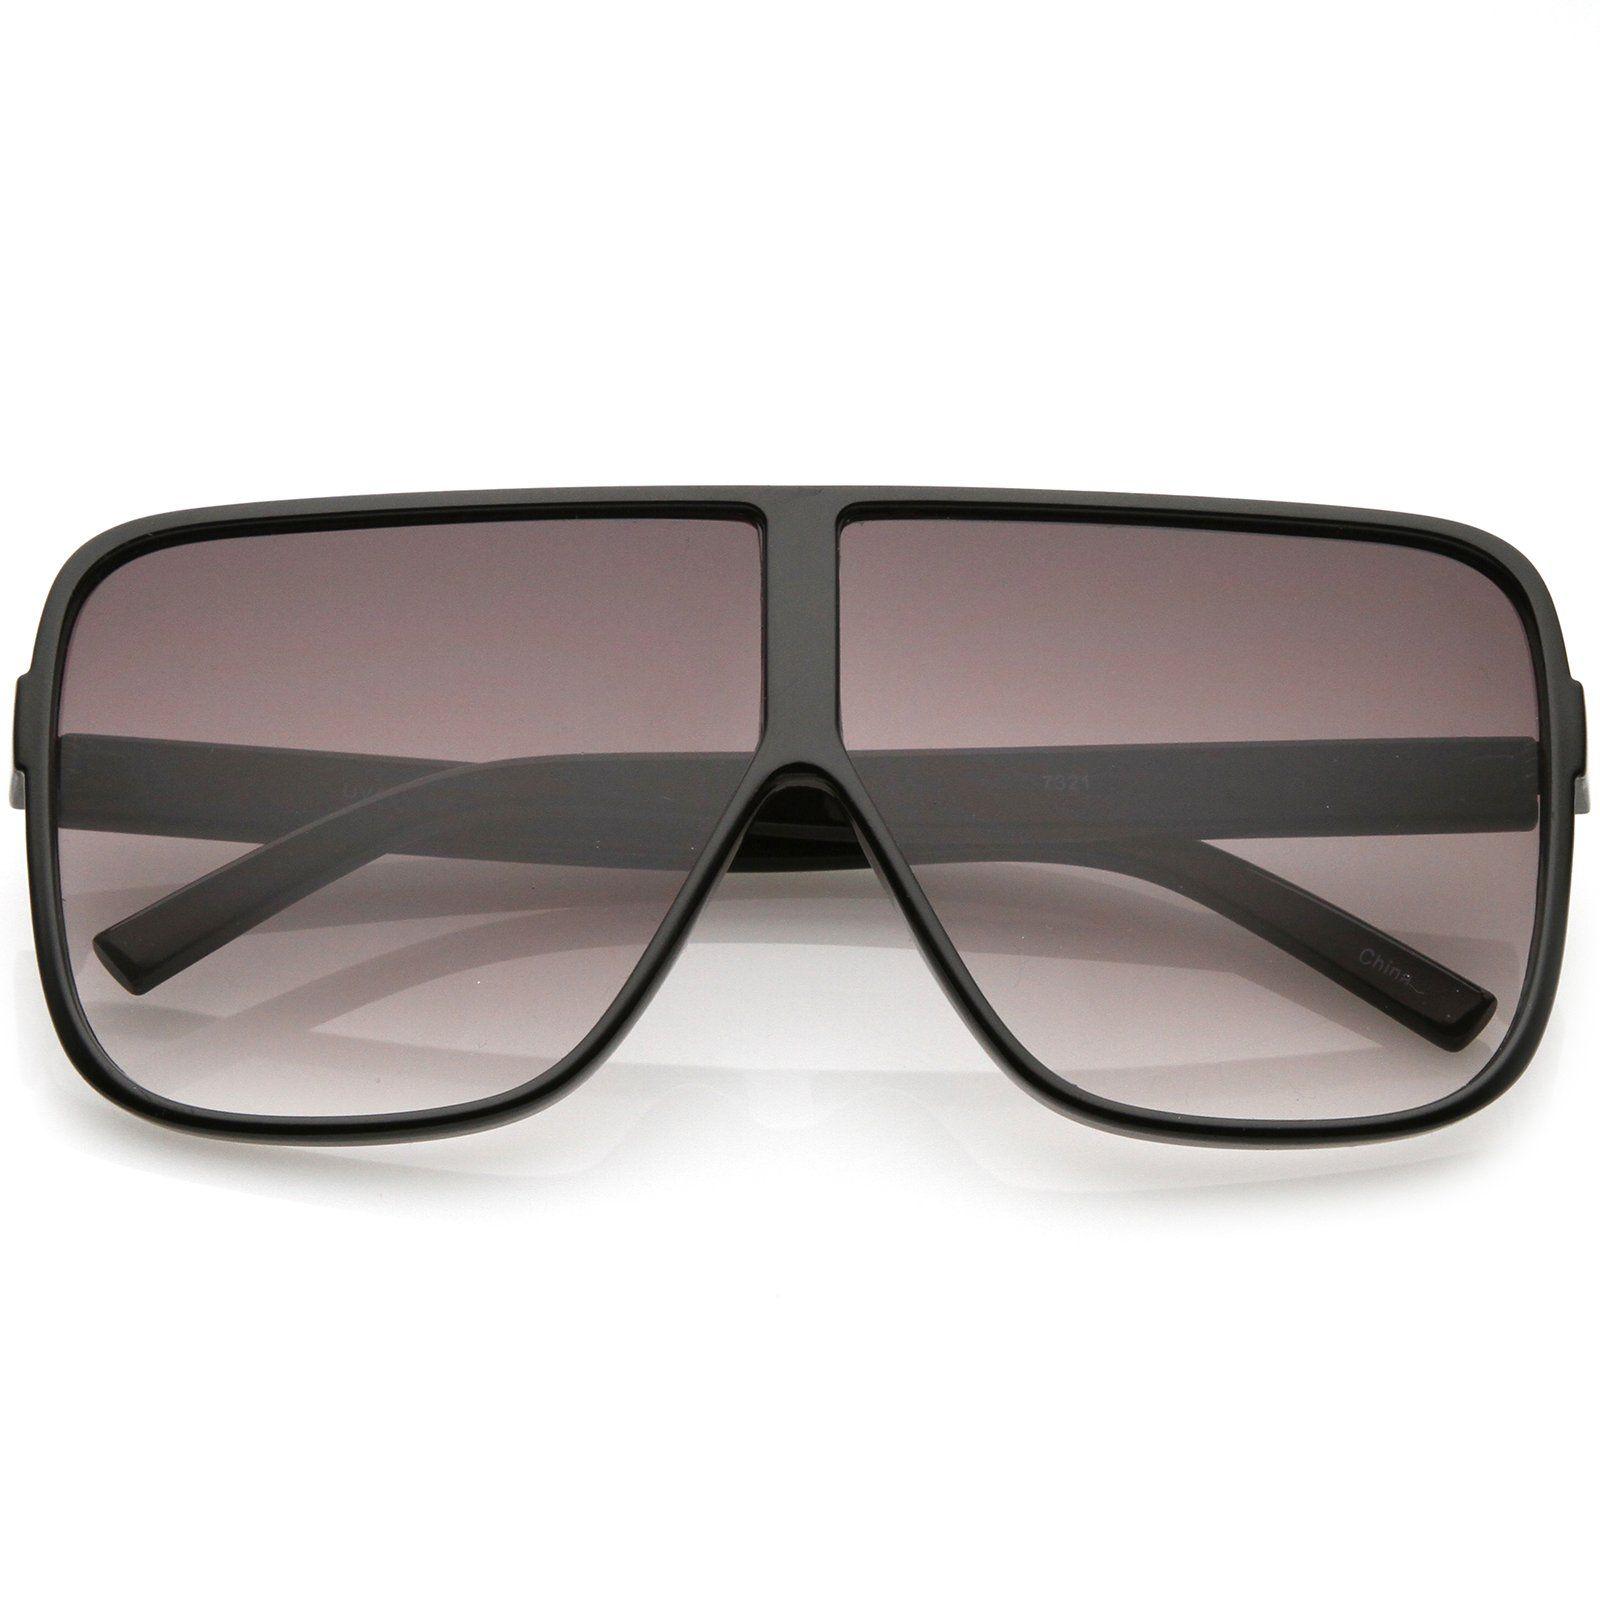 8bbff0401c6 Super Oversize Square Sunglasses Flat Top Neutral Color Flat Lens 69mm  (Black   Lavender)